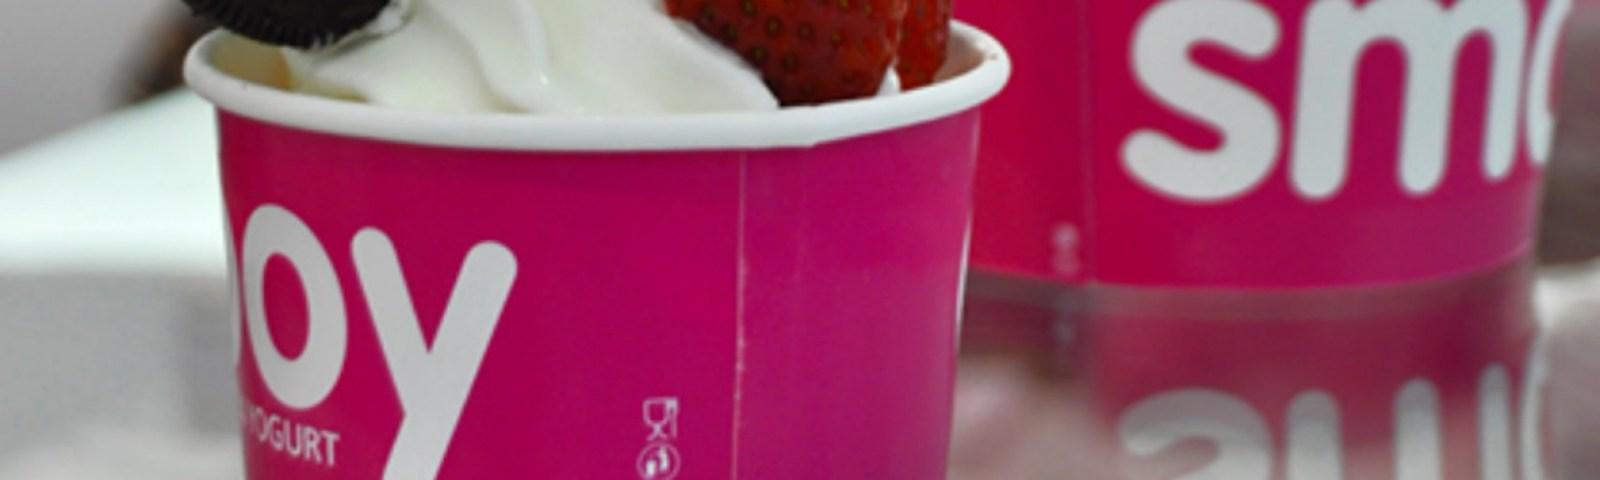 1266-smooy-iogurte-gelado-infofranchising